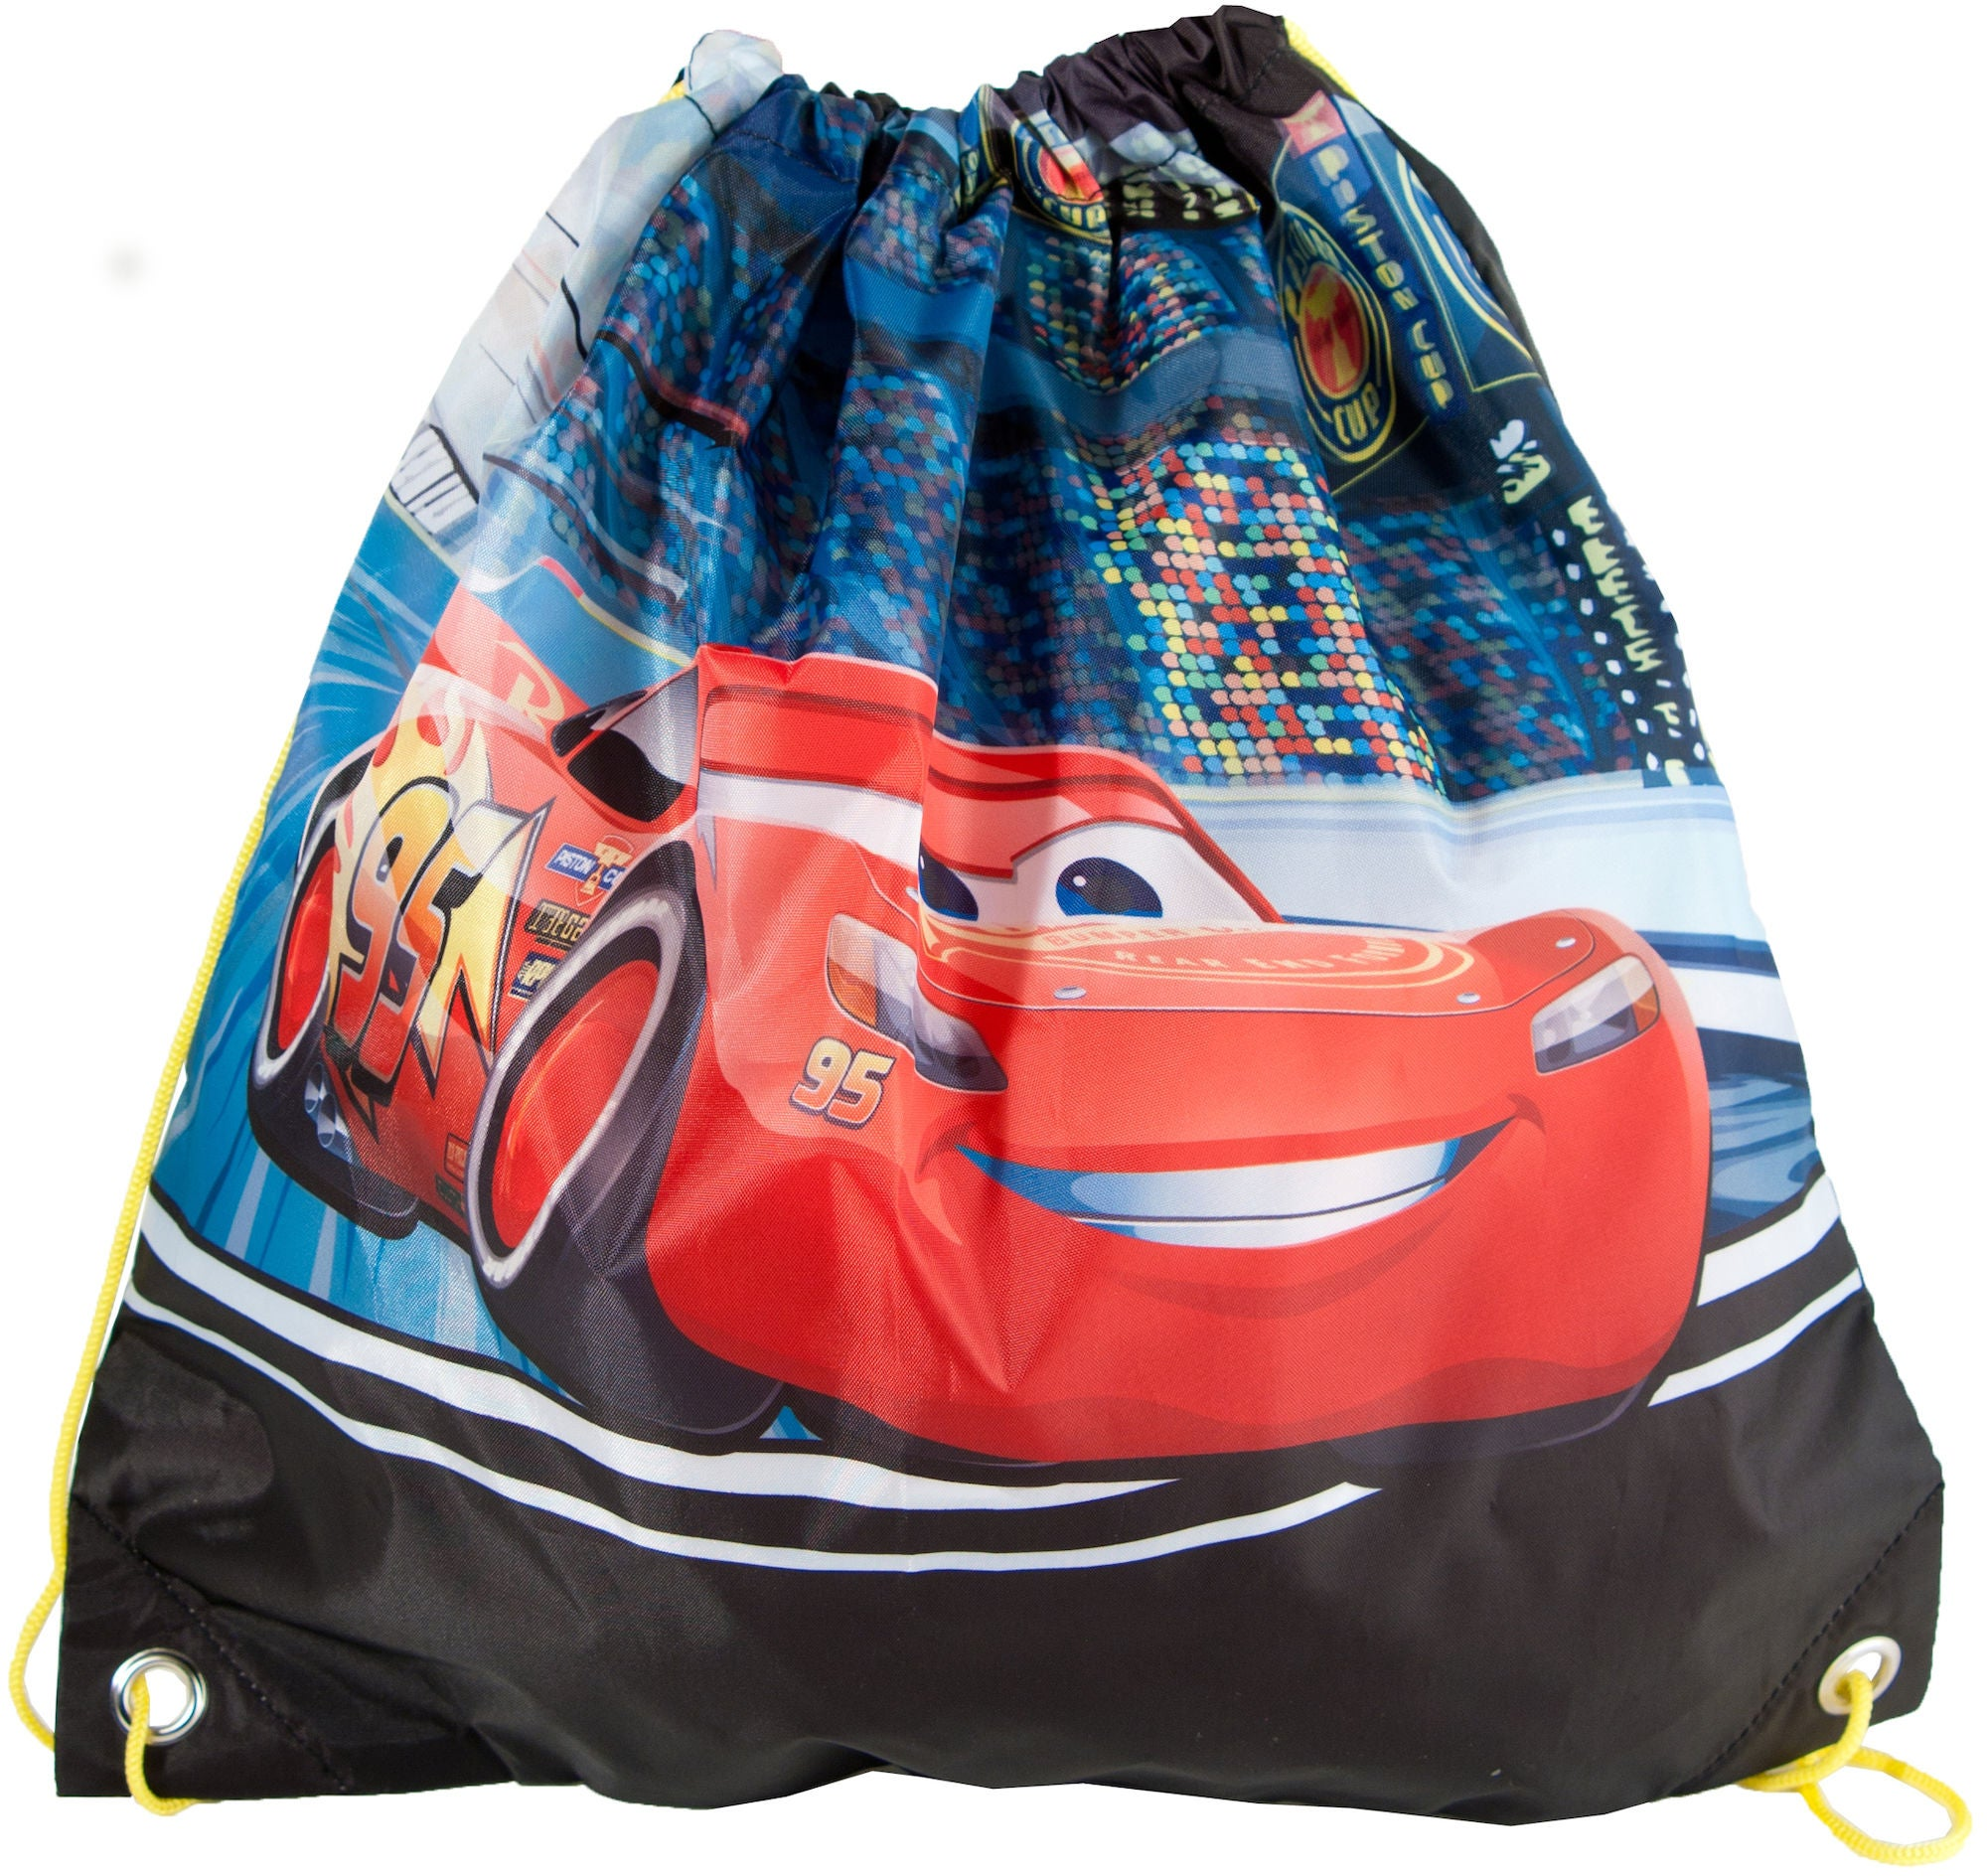 Köp Disney Cars Gympapåse f3db47f1bb4e2